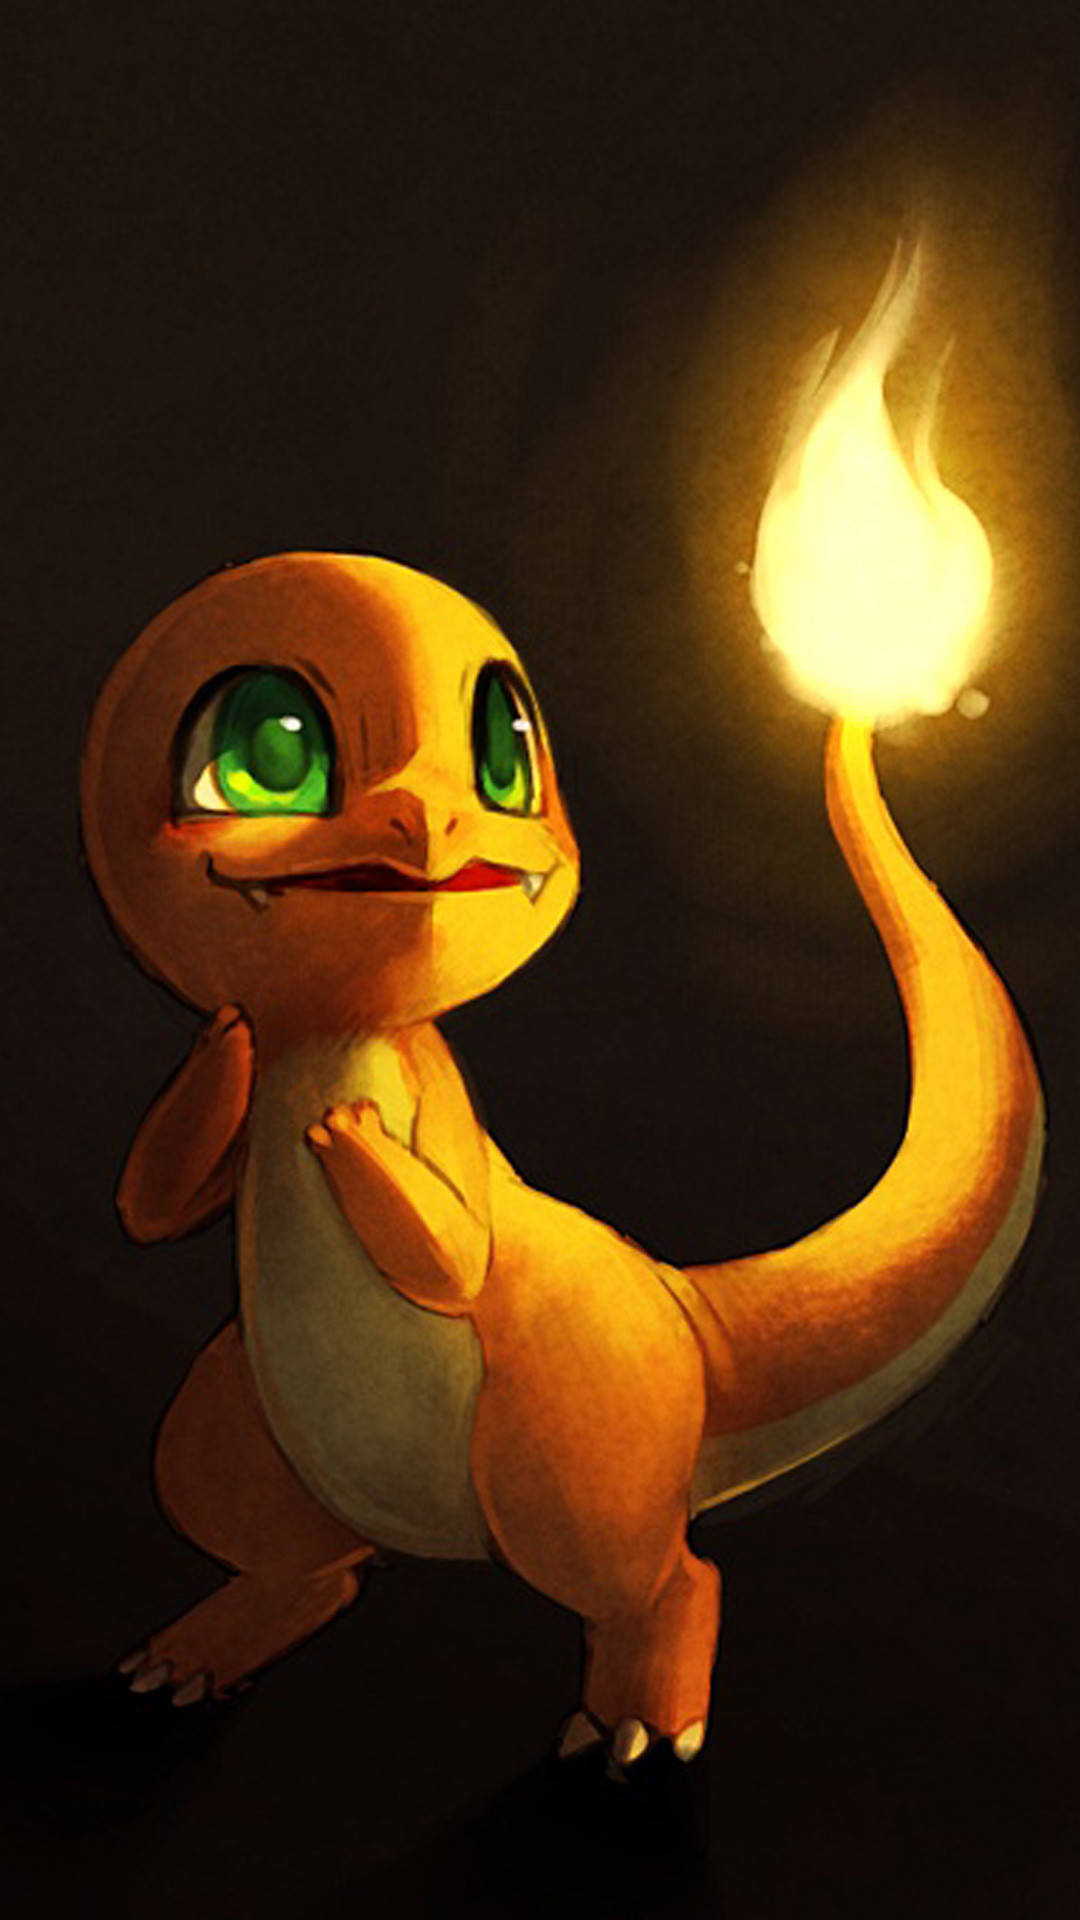 Charmander Pokemon Go iphone 7 Plus wallpaper